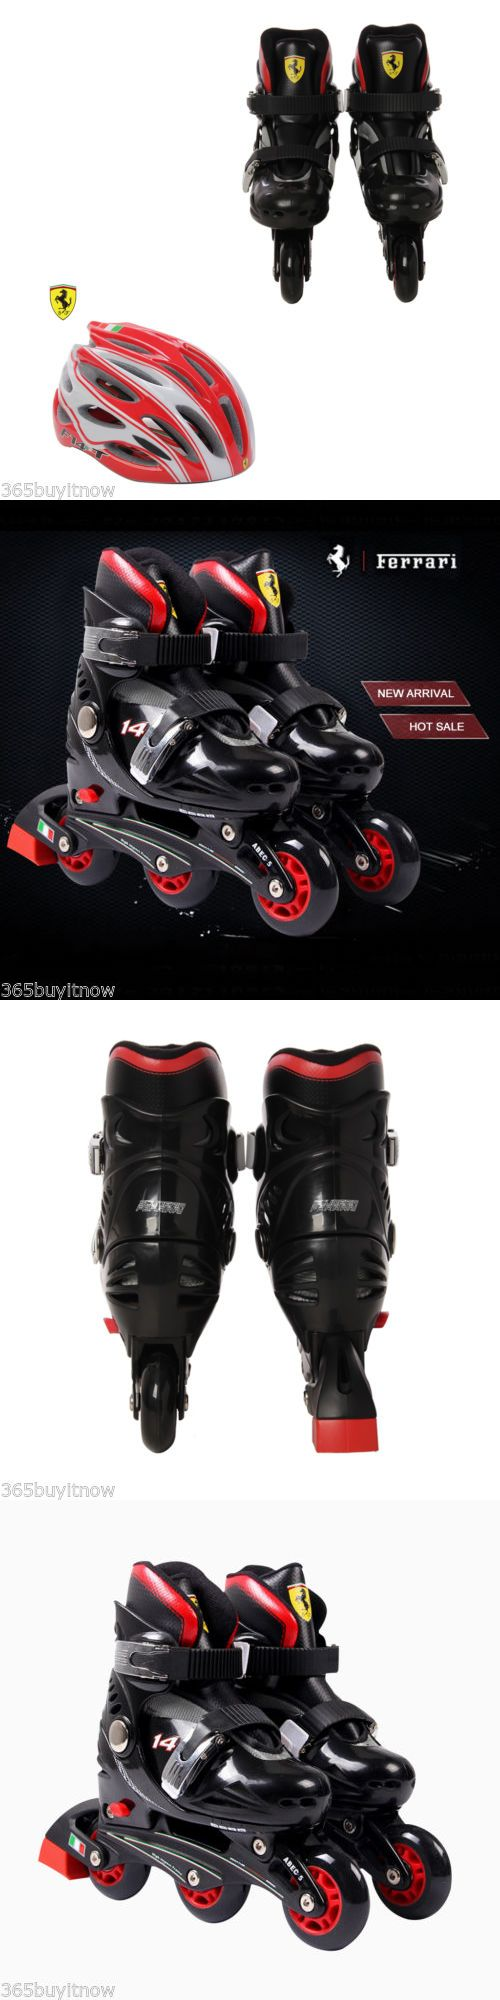 Roller skates for sale dubai - Youth 47345 Kids Inline Skate Roller Blades Adjustable Size S 29 32 With Skating Helmets Us Buy It Now Only 46 99 On Ebay